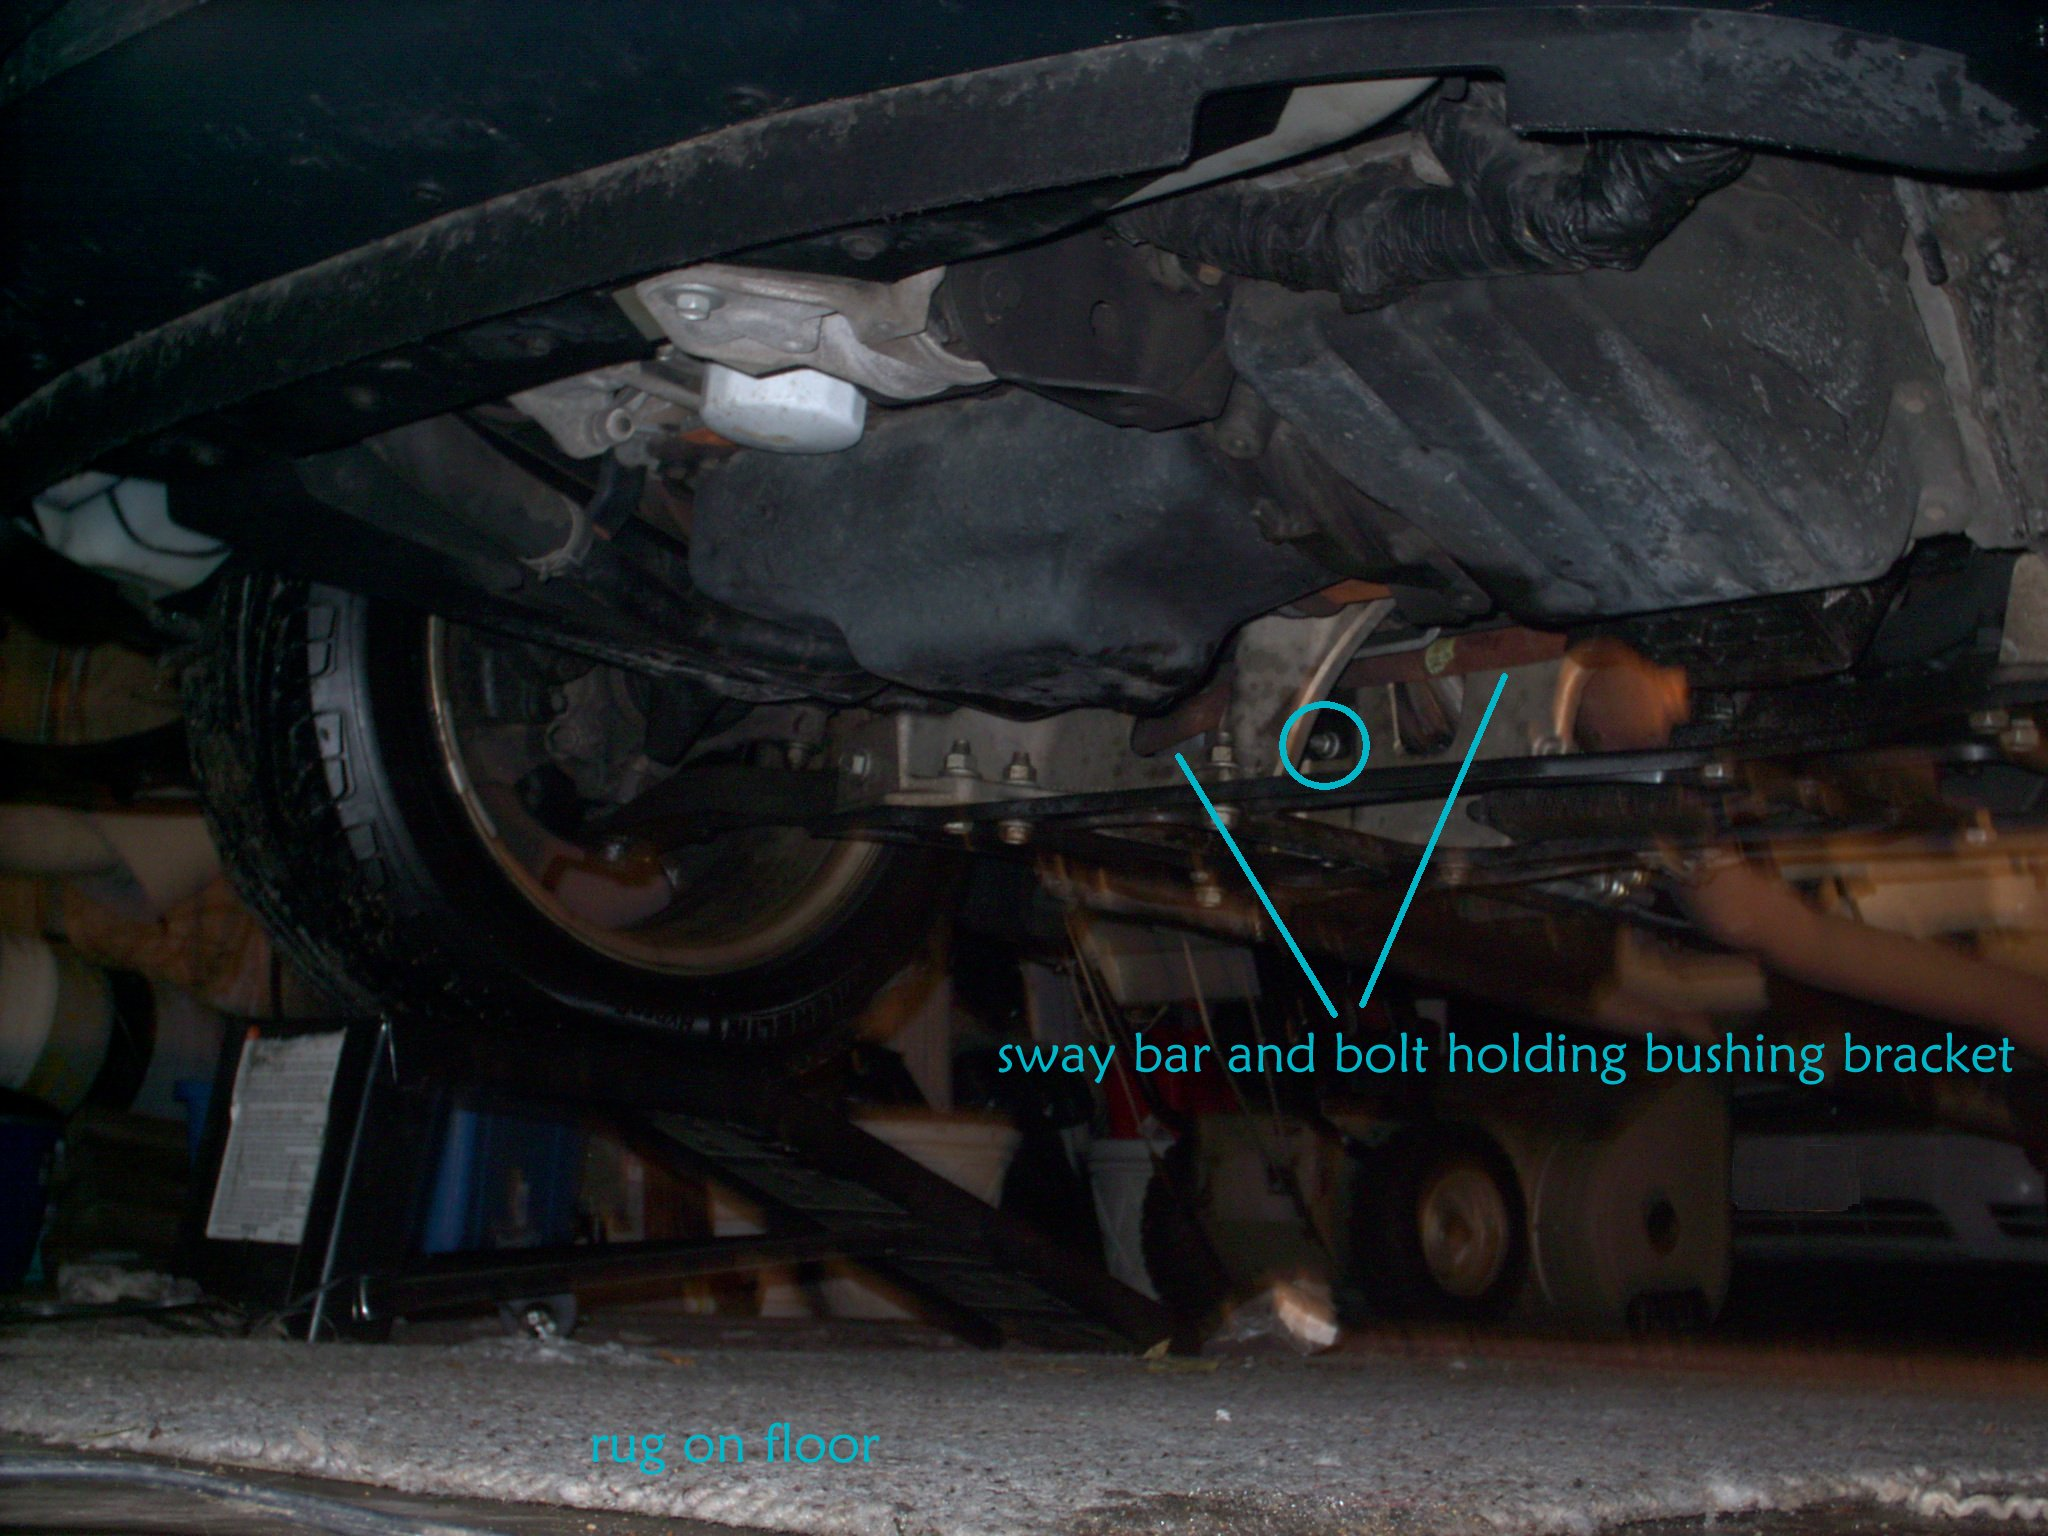 2002 Lincoln Ls Coolant Diagram Engine Wiring Sway Bar Diagrams U2022 Rh 23 Eap Ing De Su Lsspension Ford F